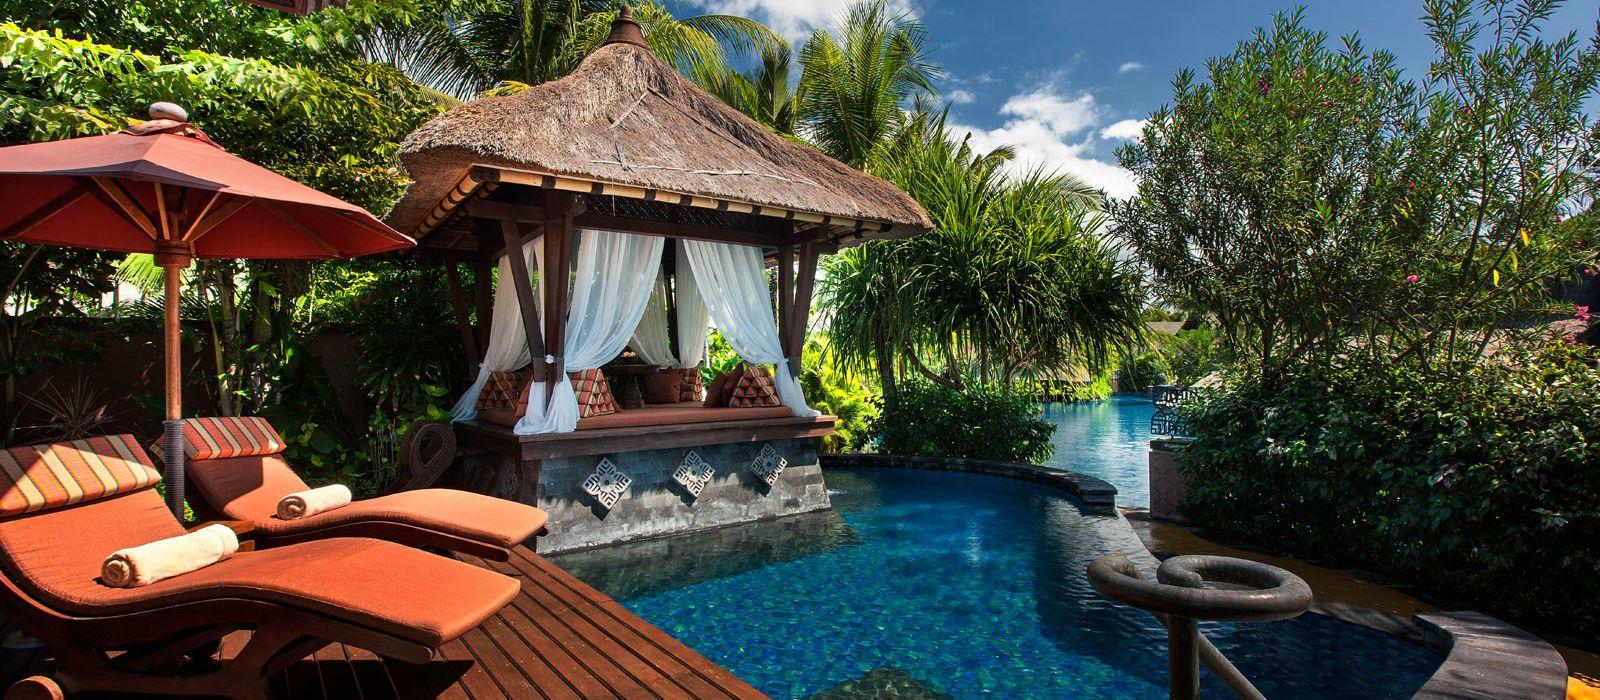 St Regis Bali Resort Hotel In Indonesia Enchanting Travels